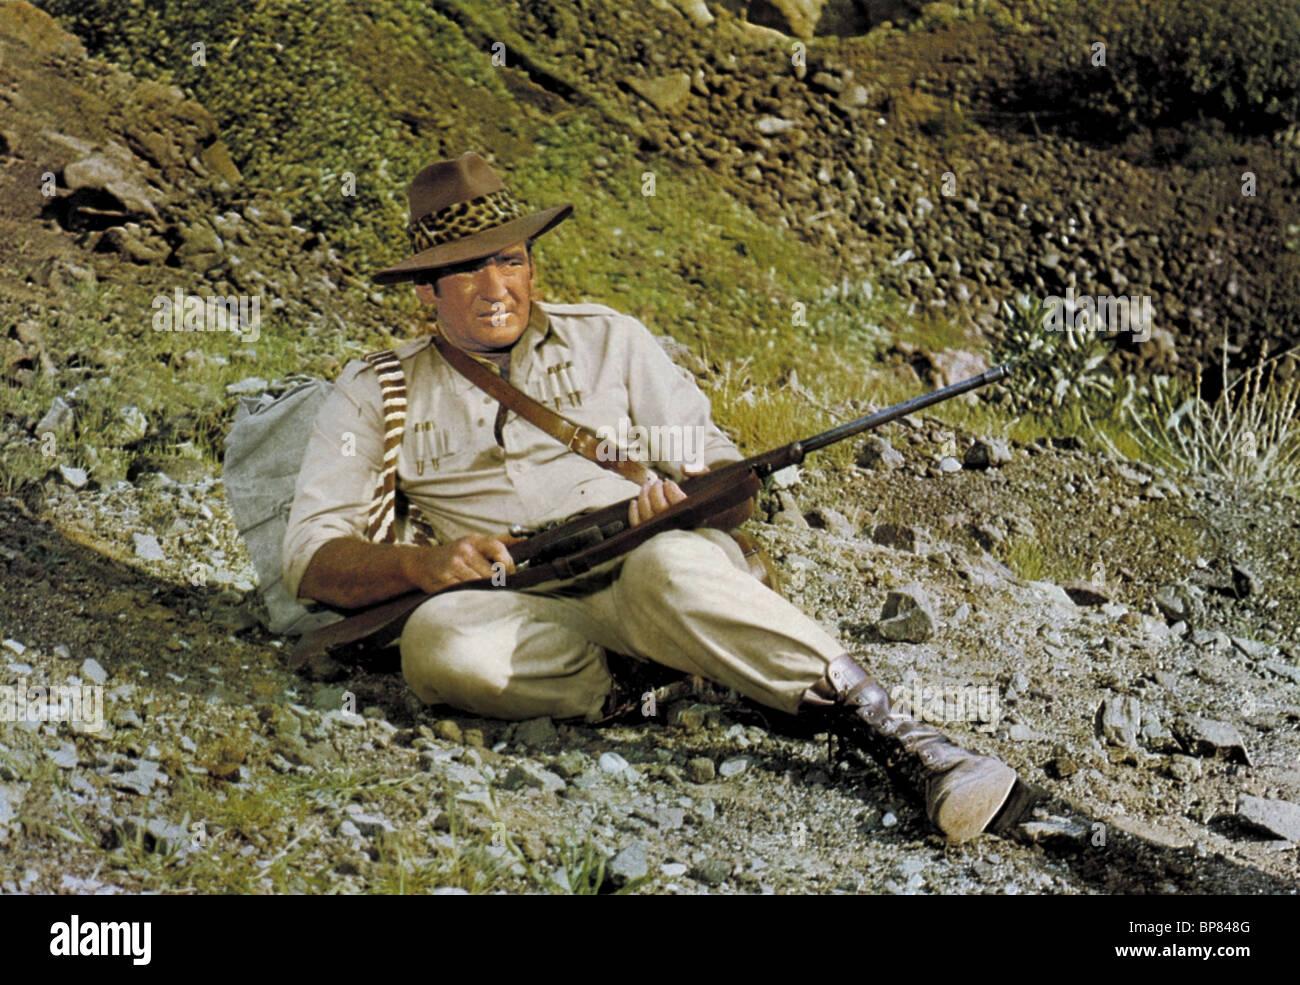 ROD TAYLOR TRADER HORN (1973) - Stock Image